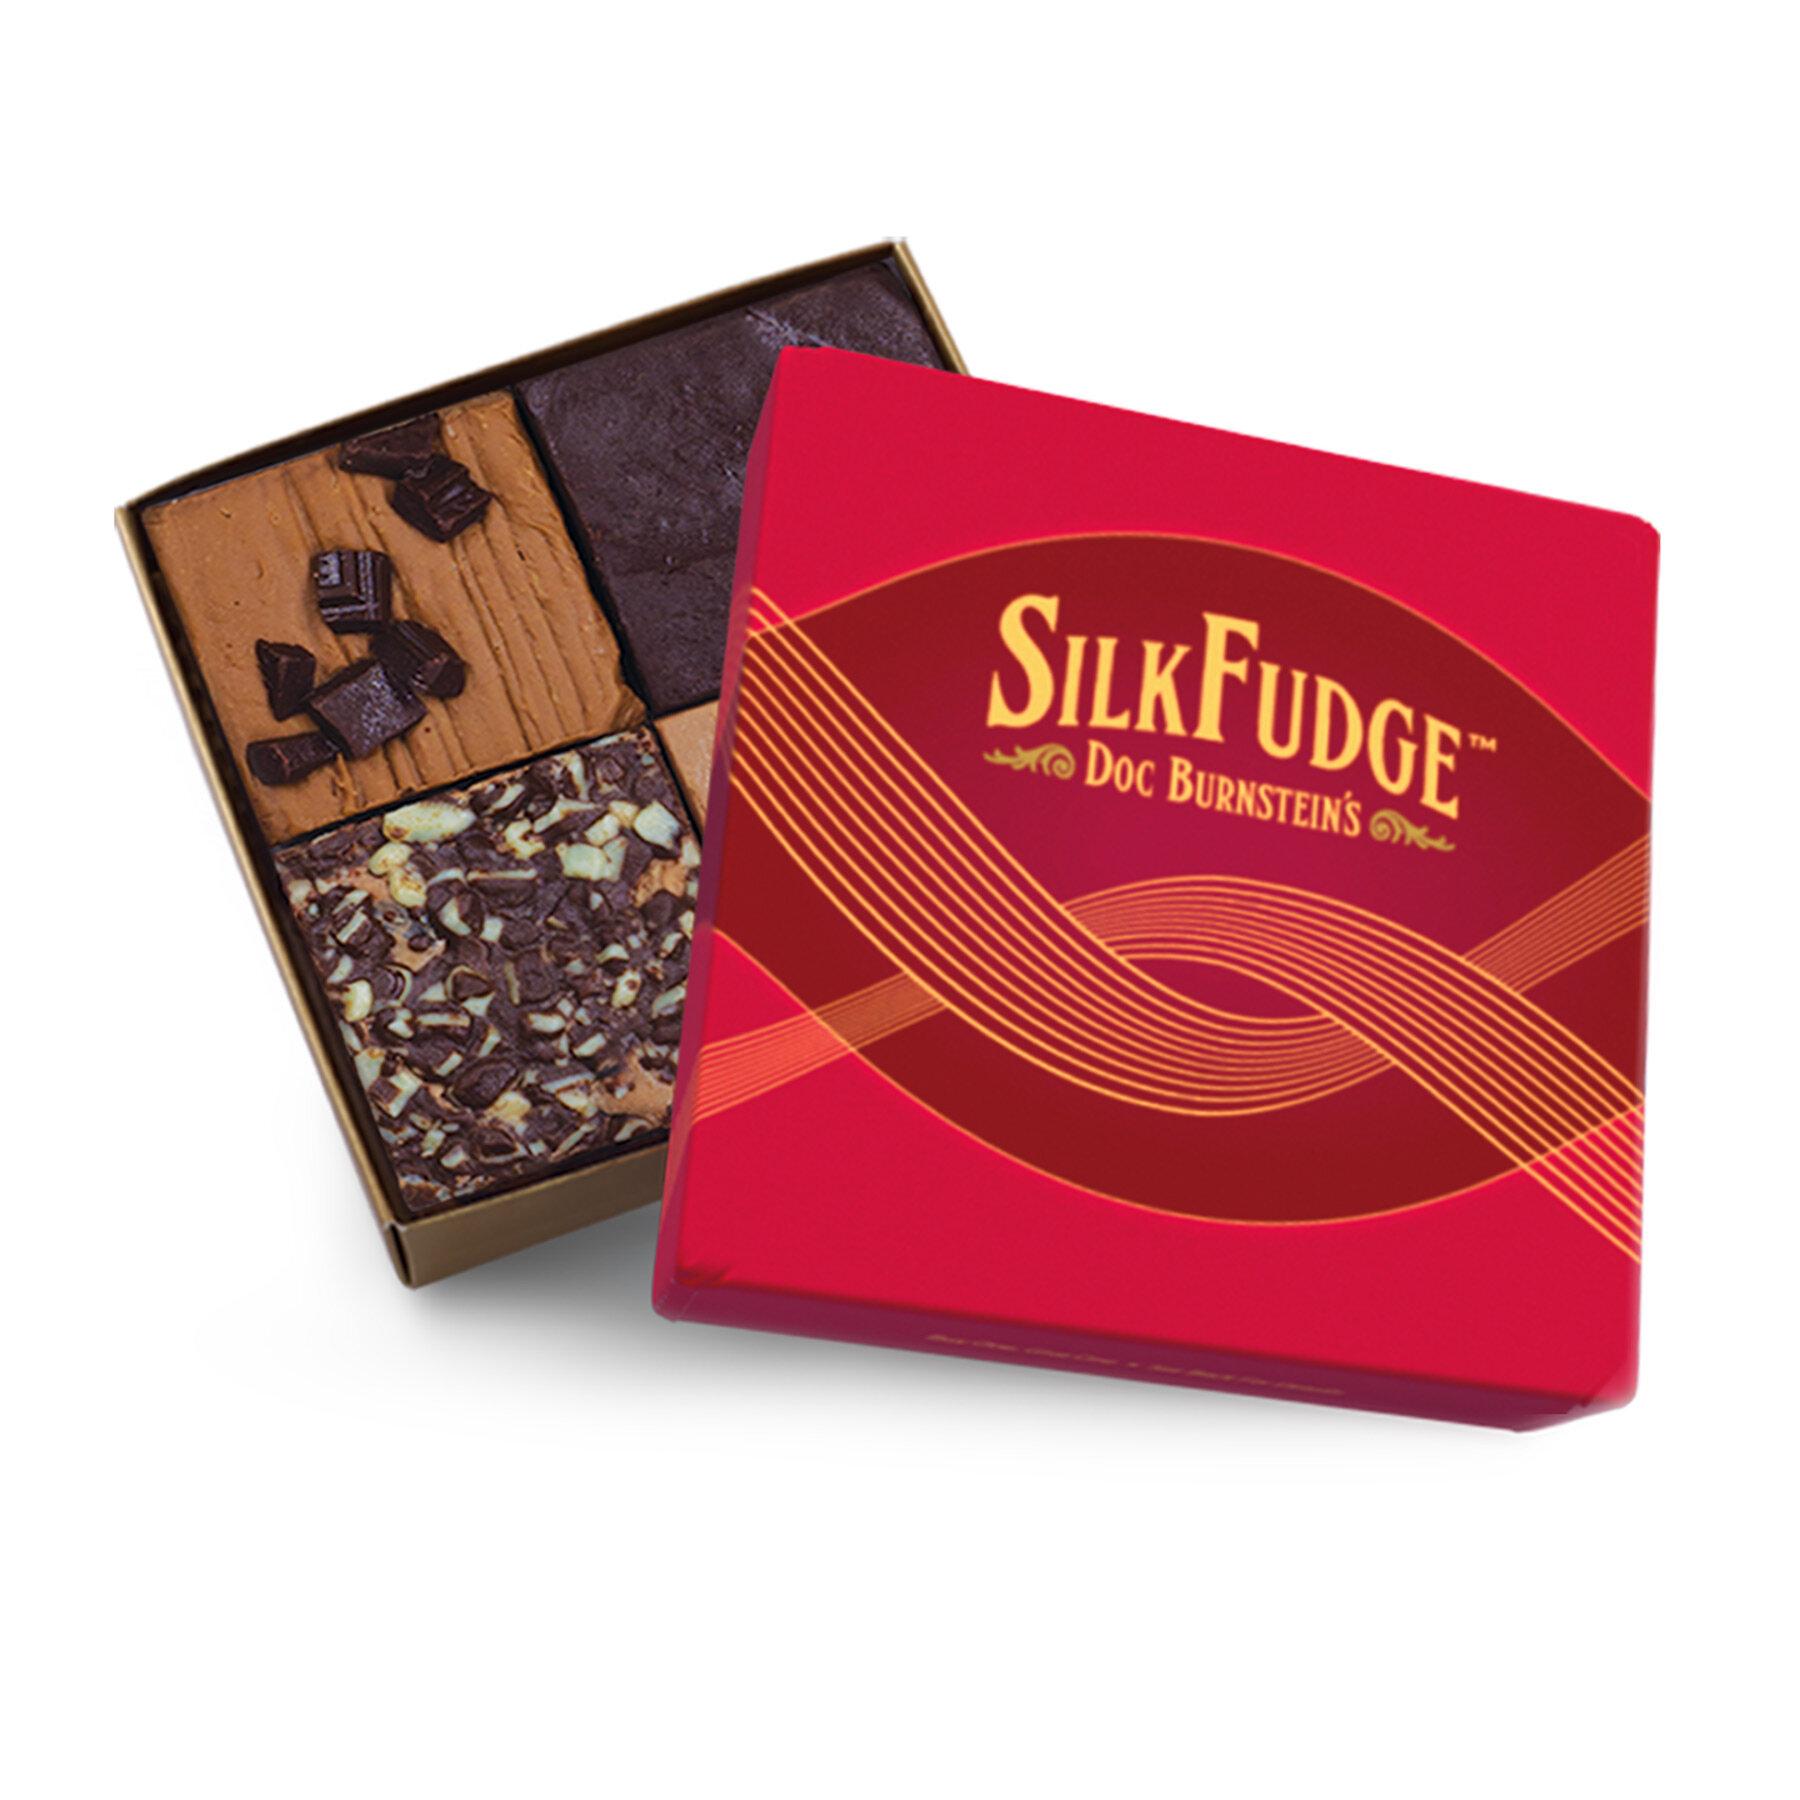 CulpritMedia-Group-Doc-Burnsteins-SilkFudge-Chocolate-Box-Design.jpg